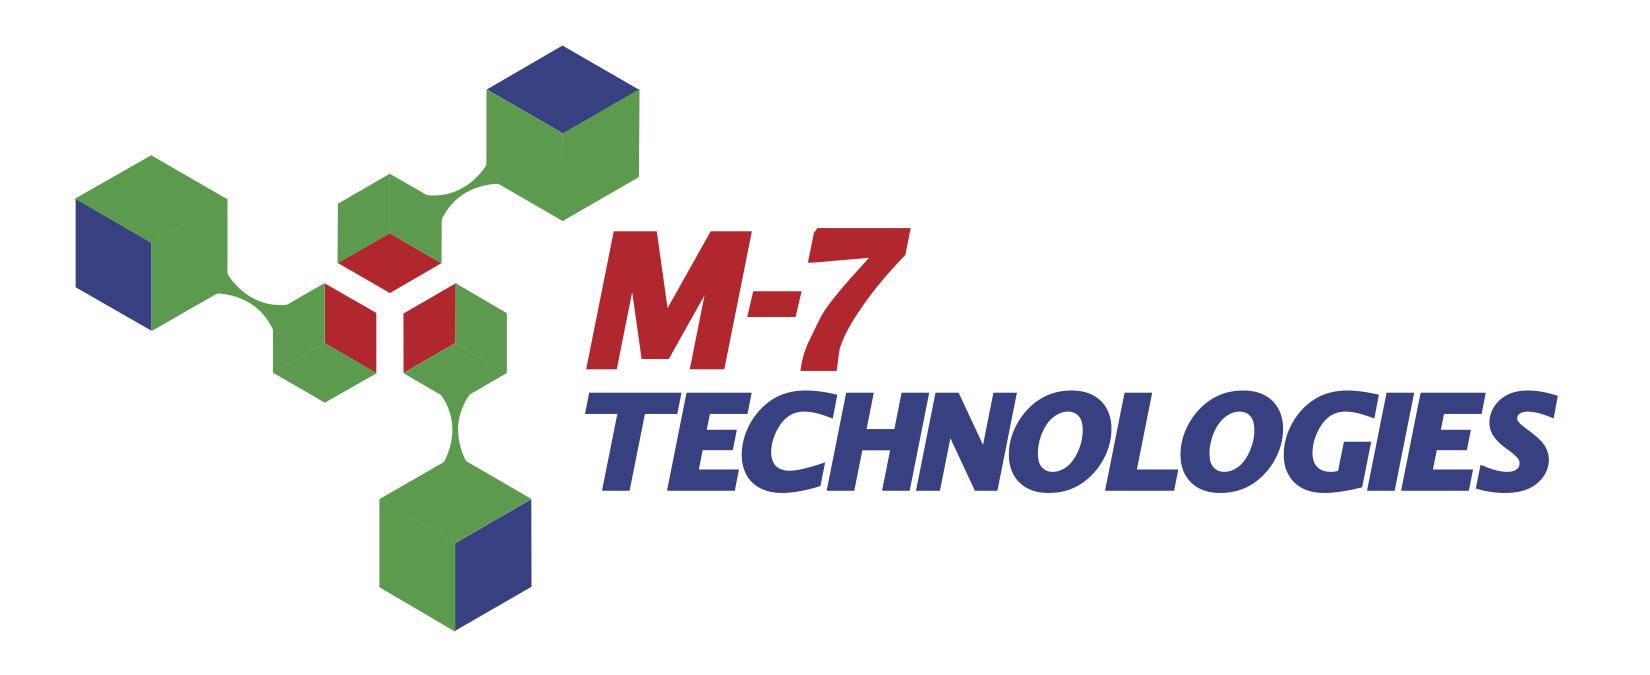 M-7 Technologies logo